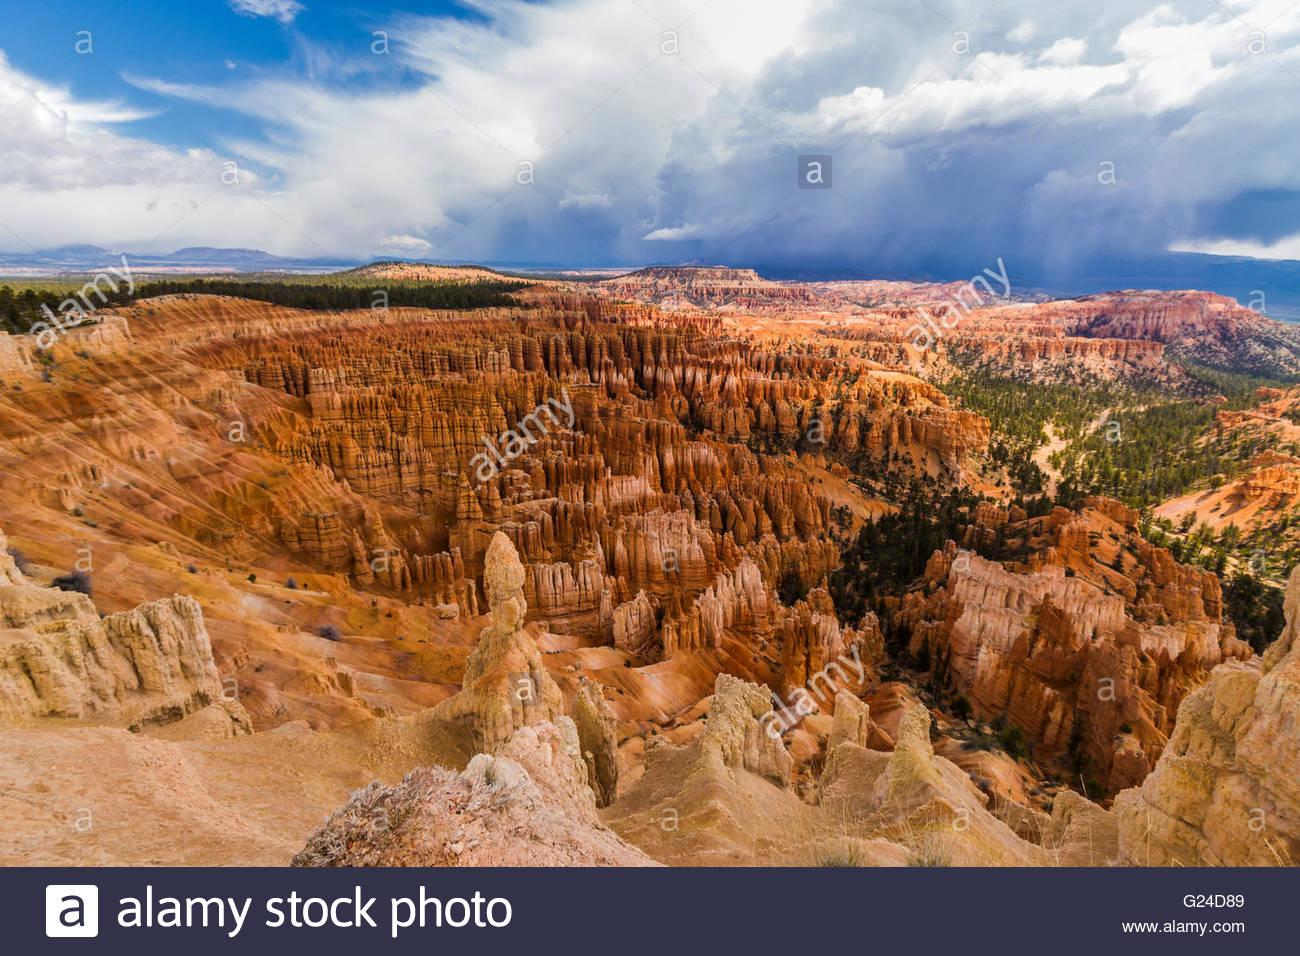 Bryce Canyon National Park Hoodoos - Stock Image